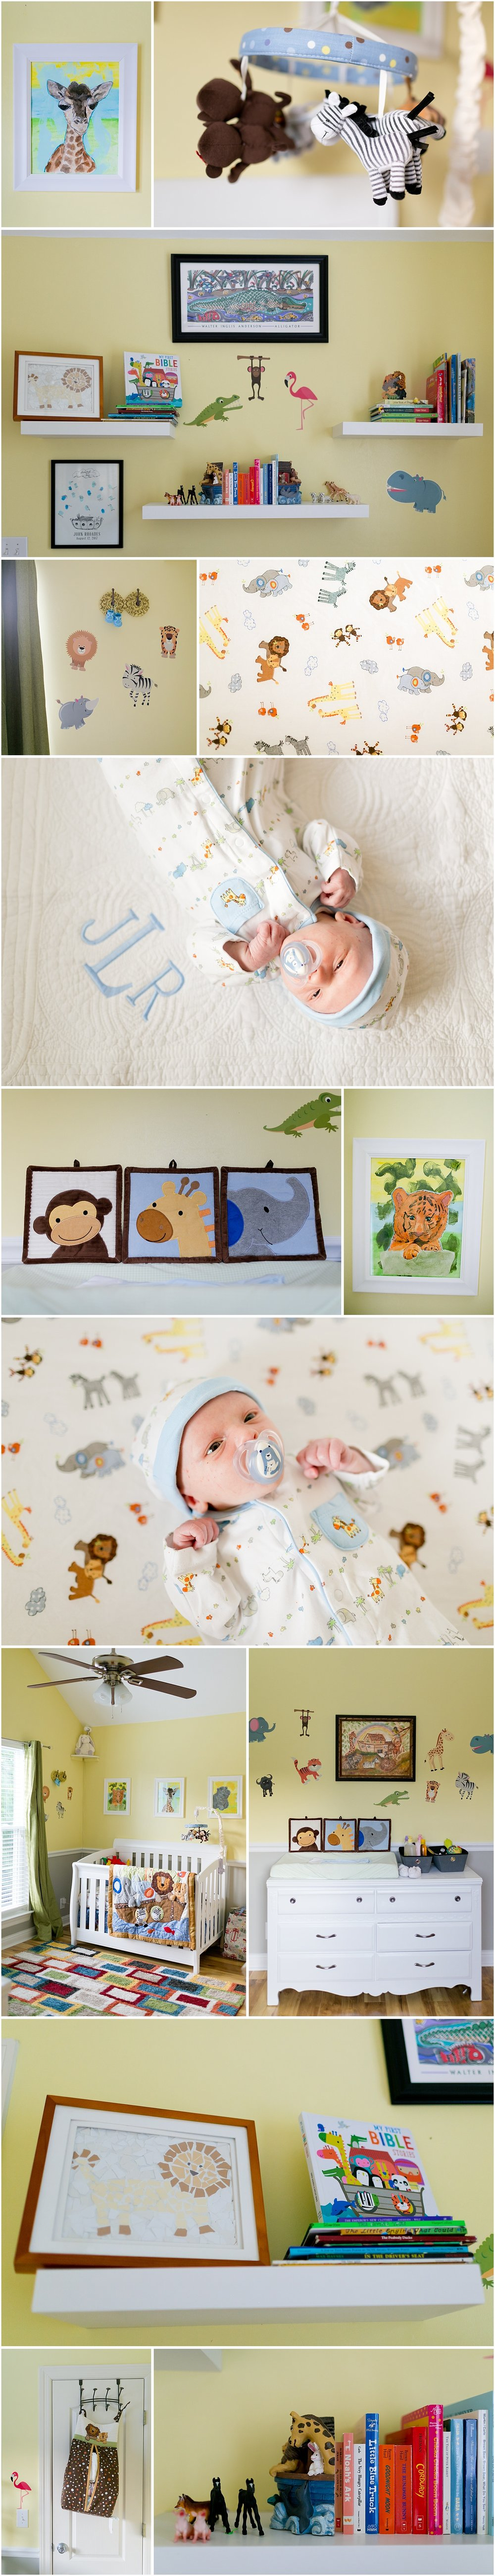 Noah's Ark / Jungle Theme Baby Boy Nursery Decor